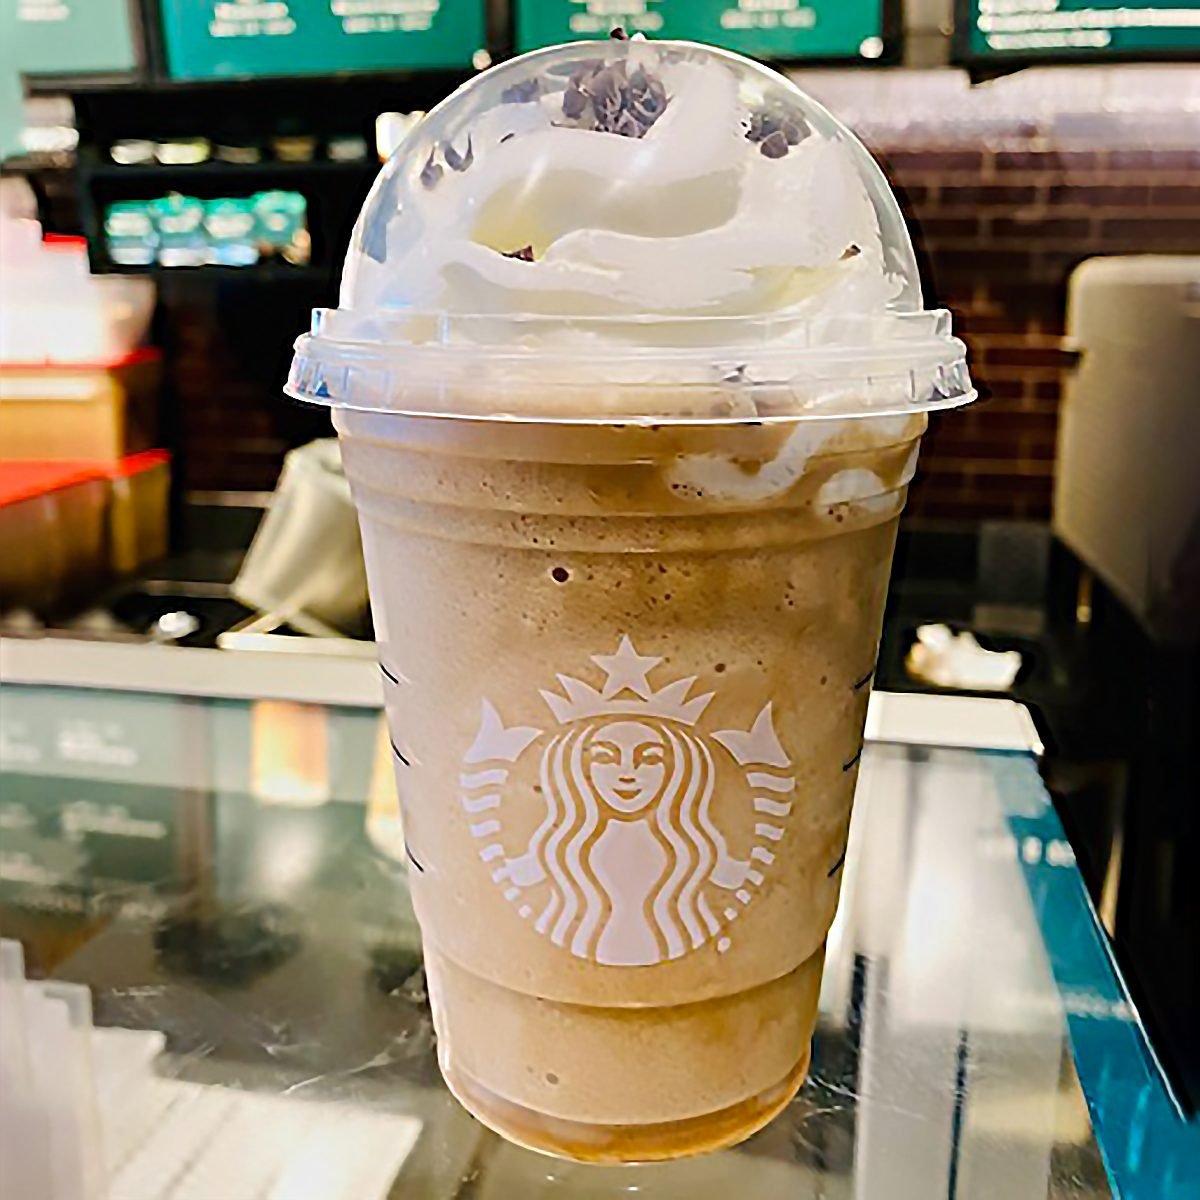 Irish Cream Frappuccino From Starbucks